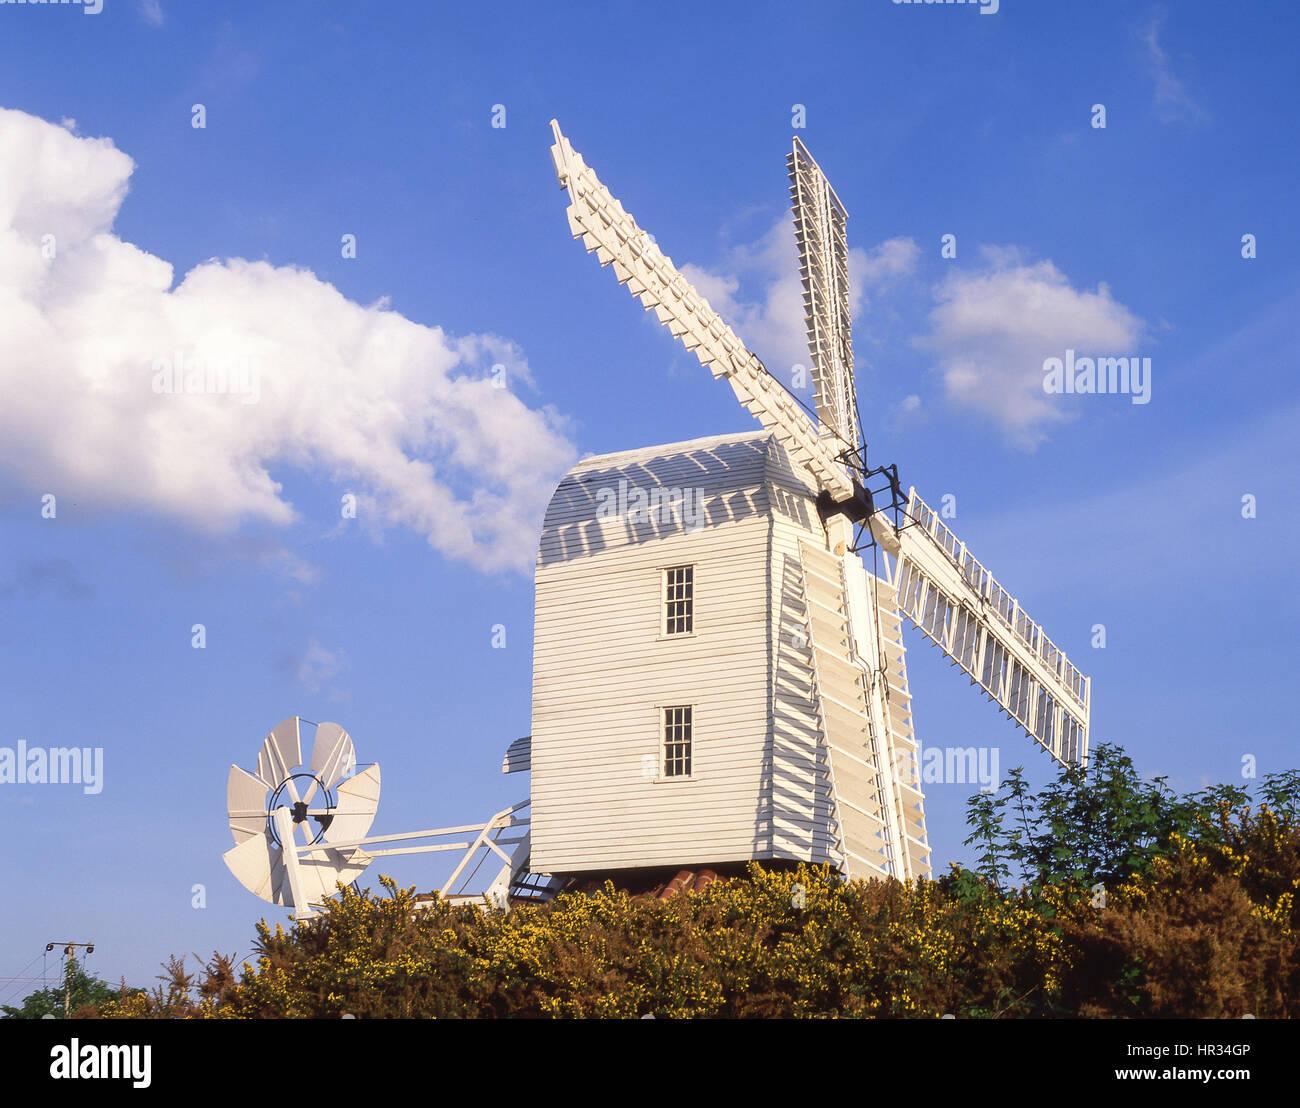 Thorpeness Windmill, Thorpeness, Suffolk, England, United Kingdom - Stock Image